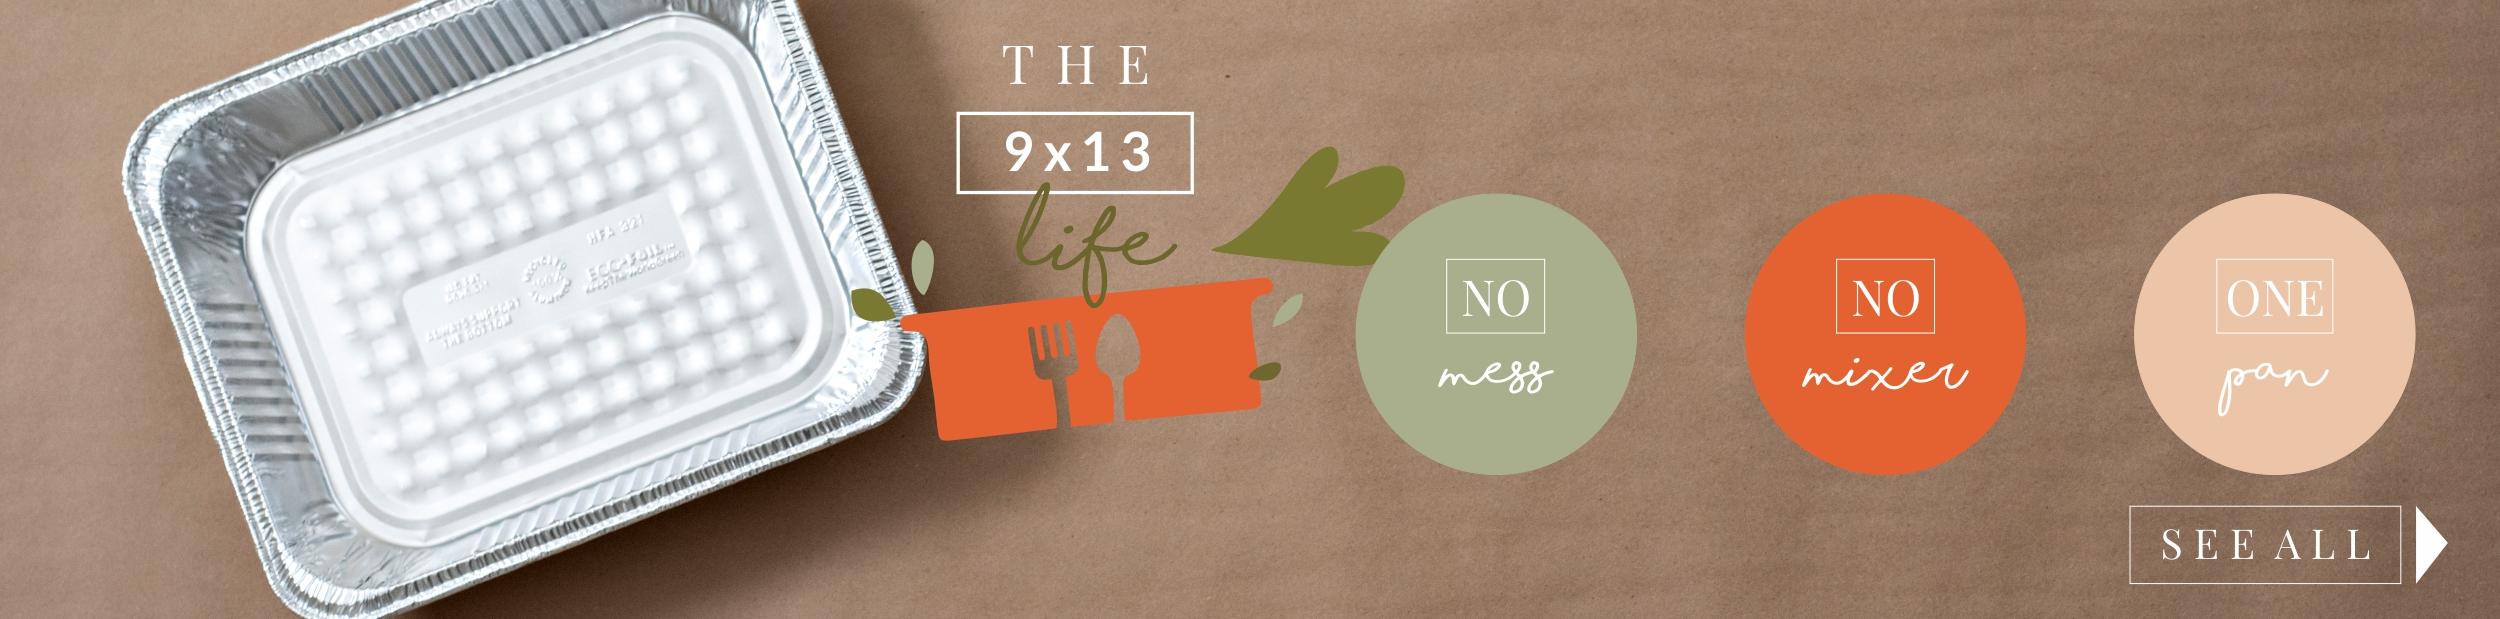 9x13 life bcp